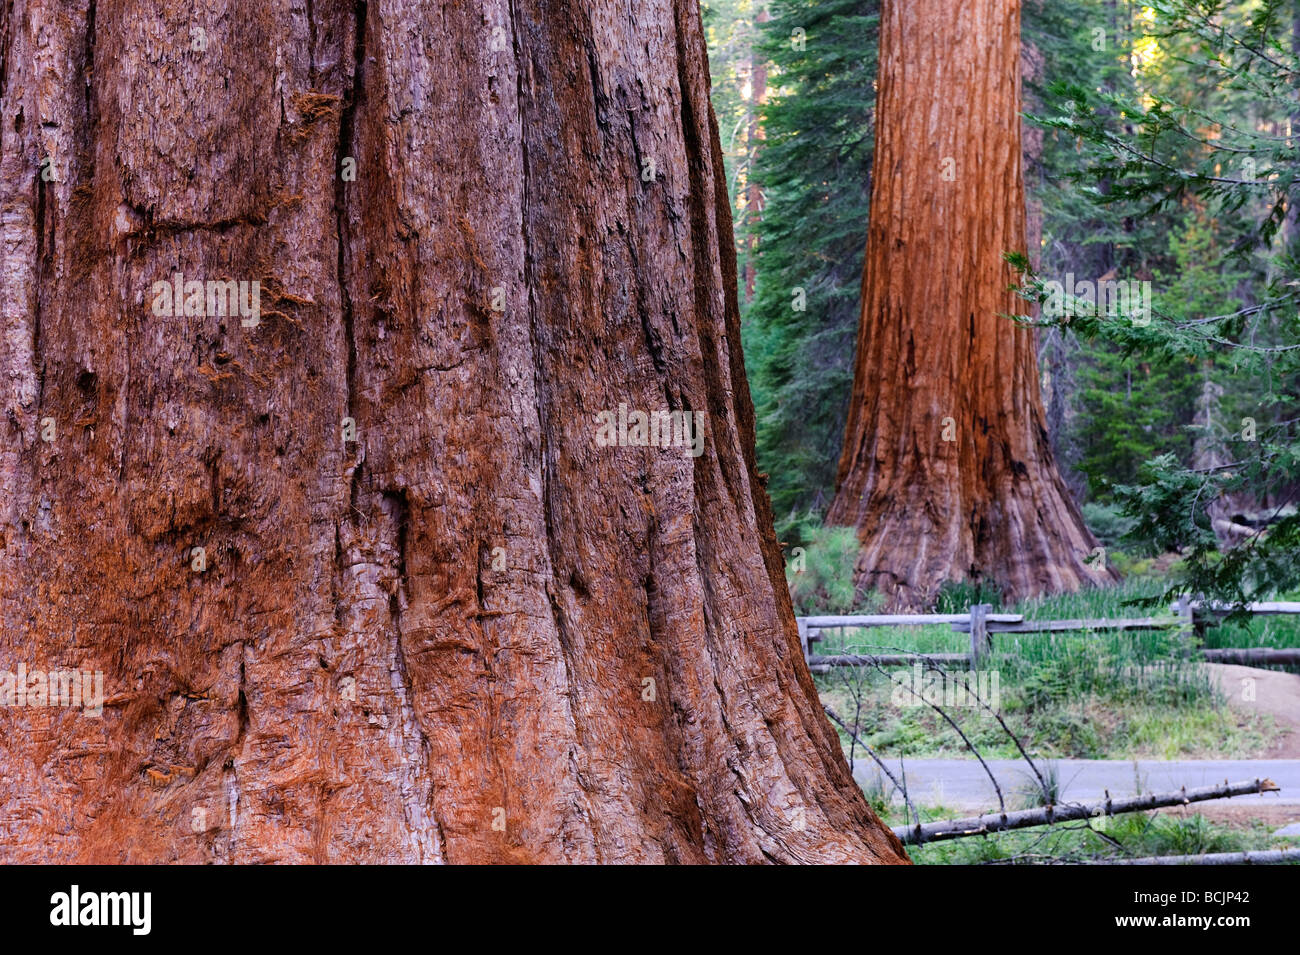 USA, California, Yosemite National Park, Mariposa Grove, Giant Sequoias Stock Photo